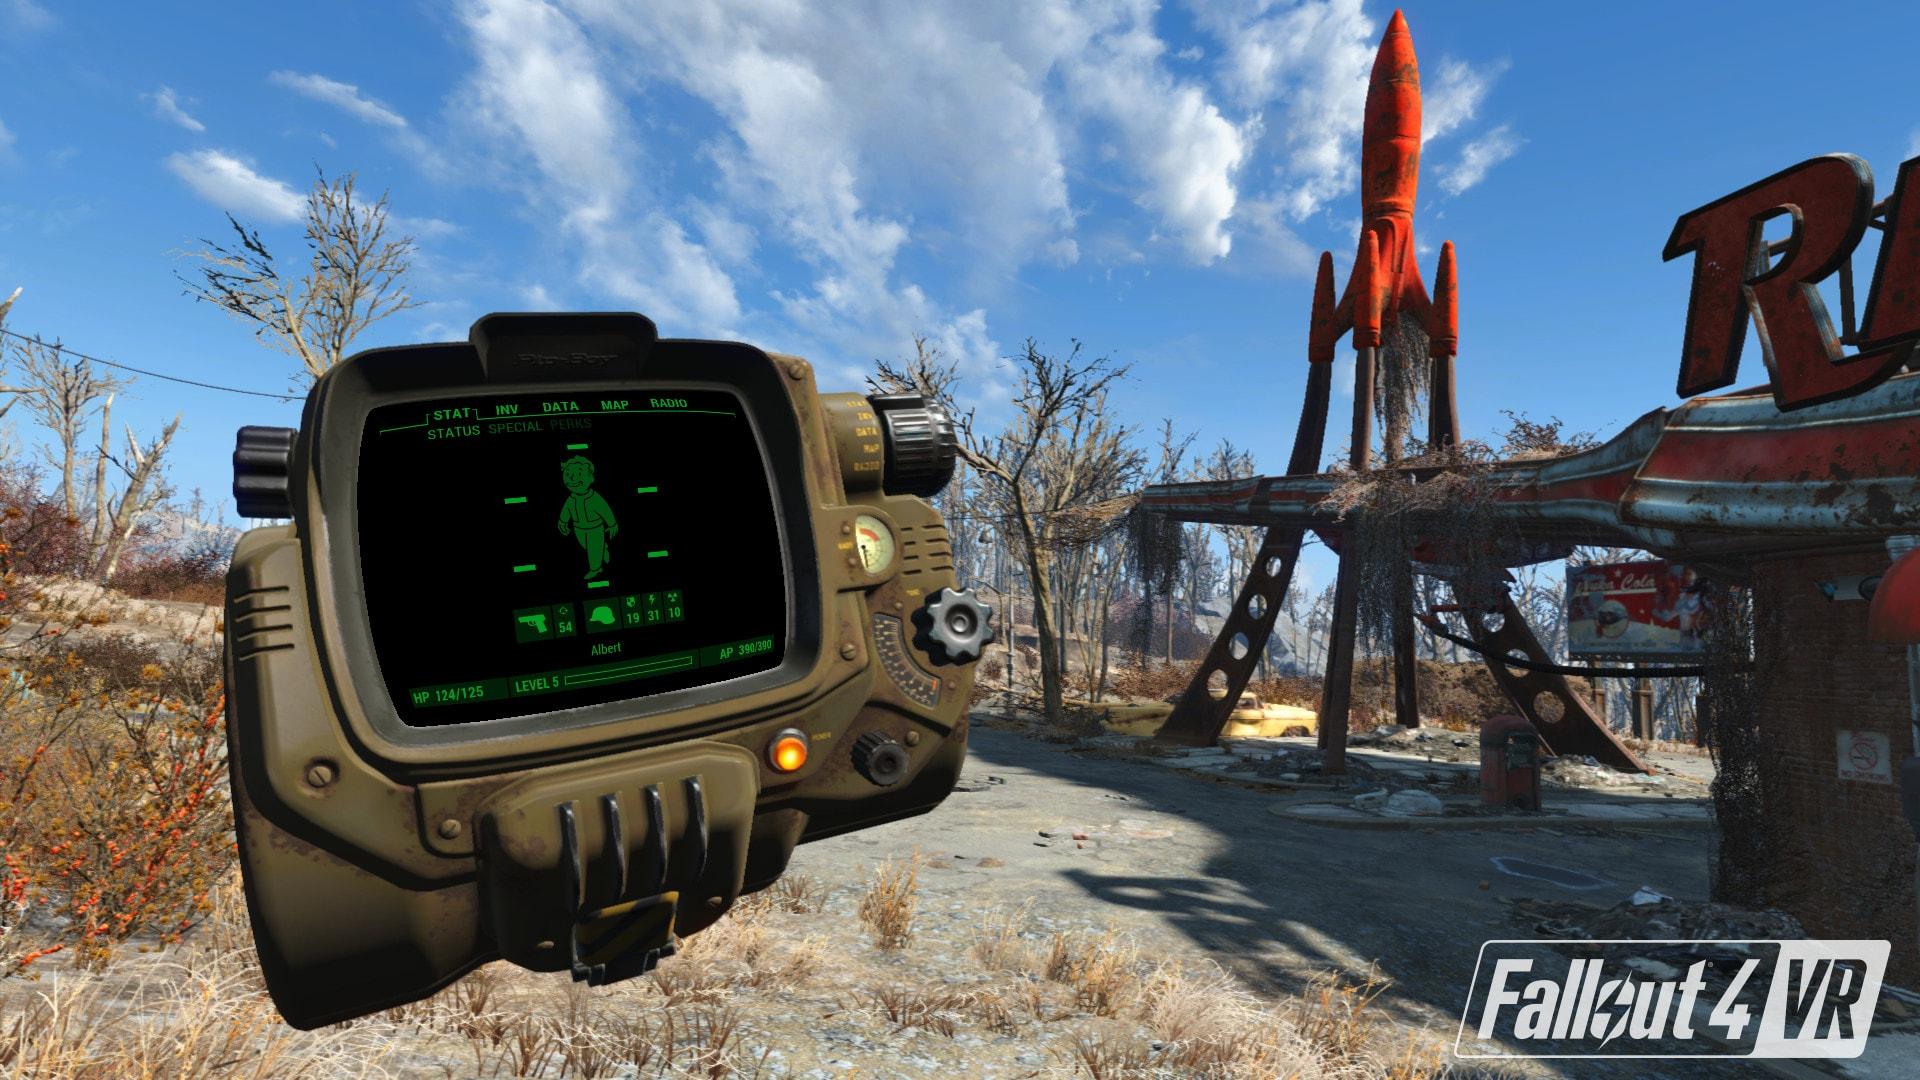 Fallout 4 VR (PC) - Steam Key - GLOBAL - 4